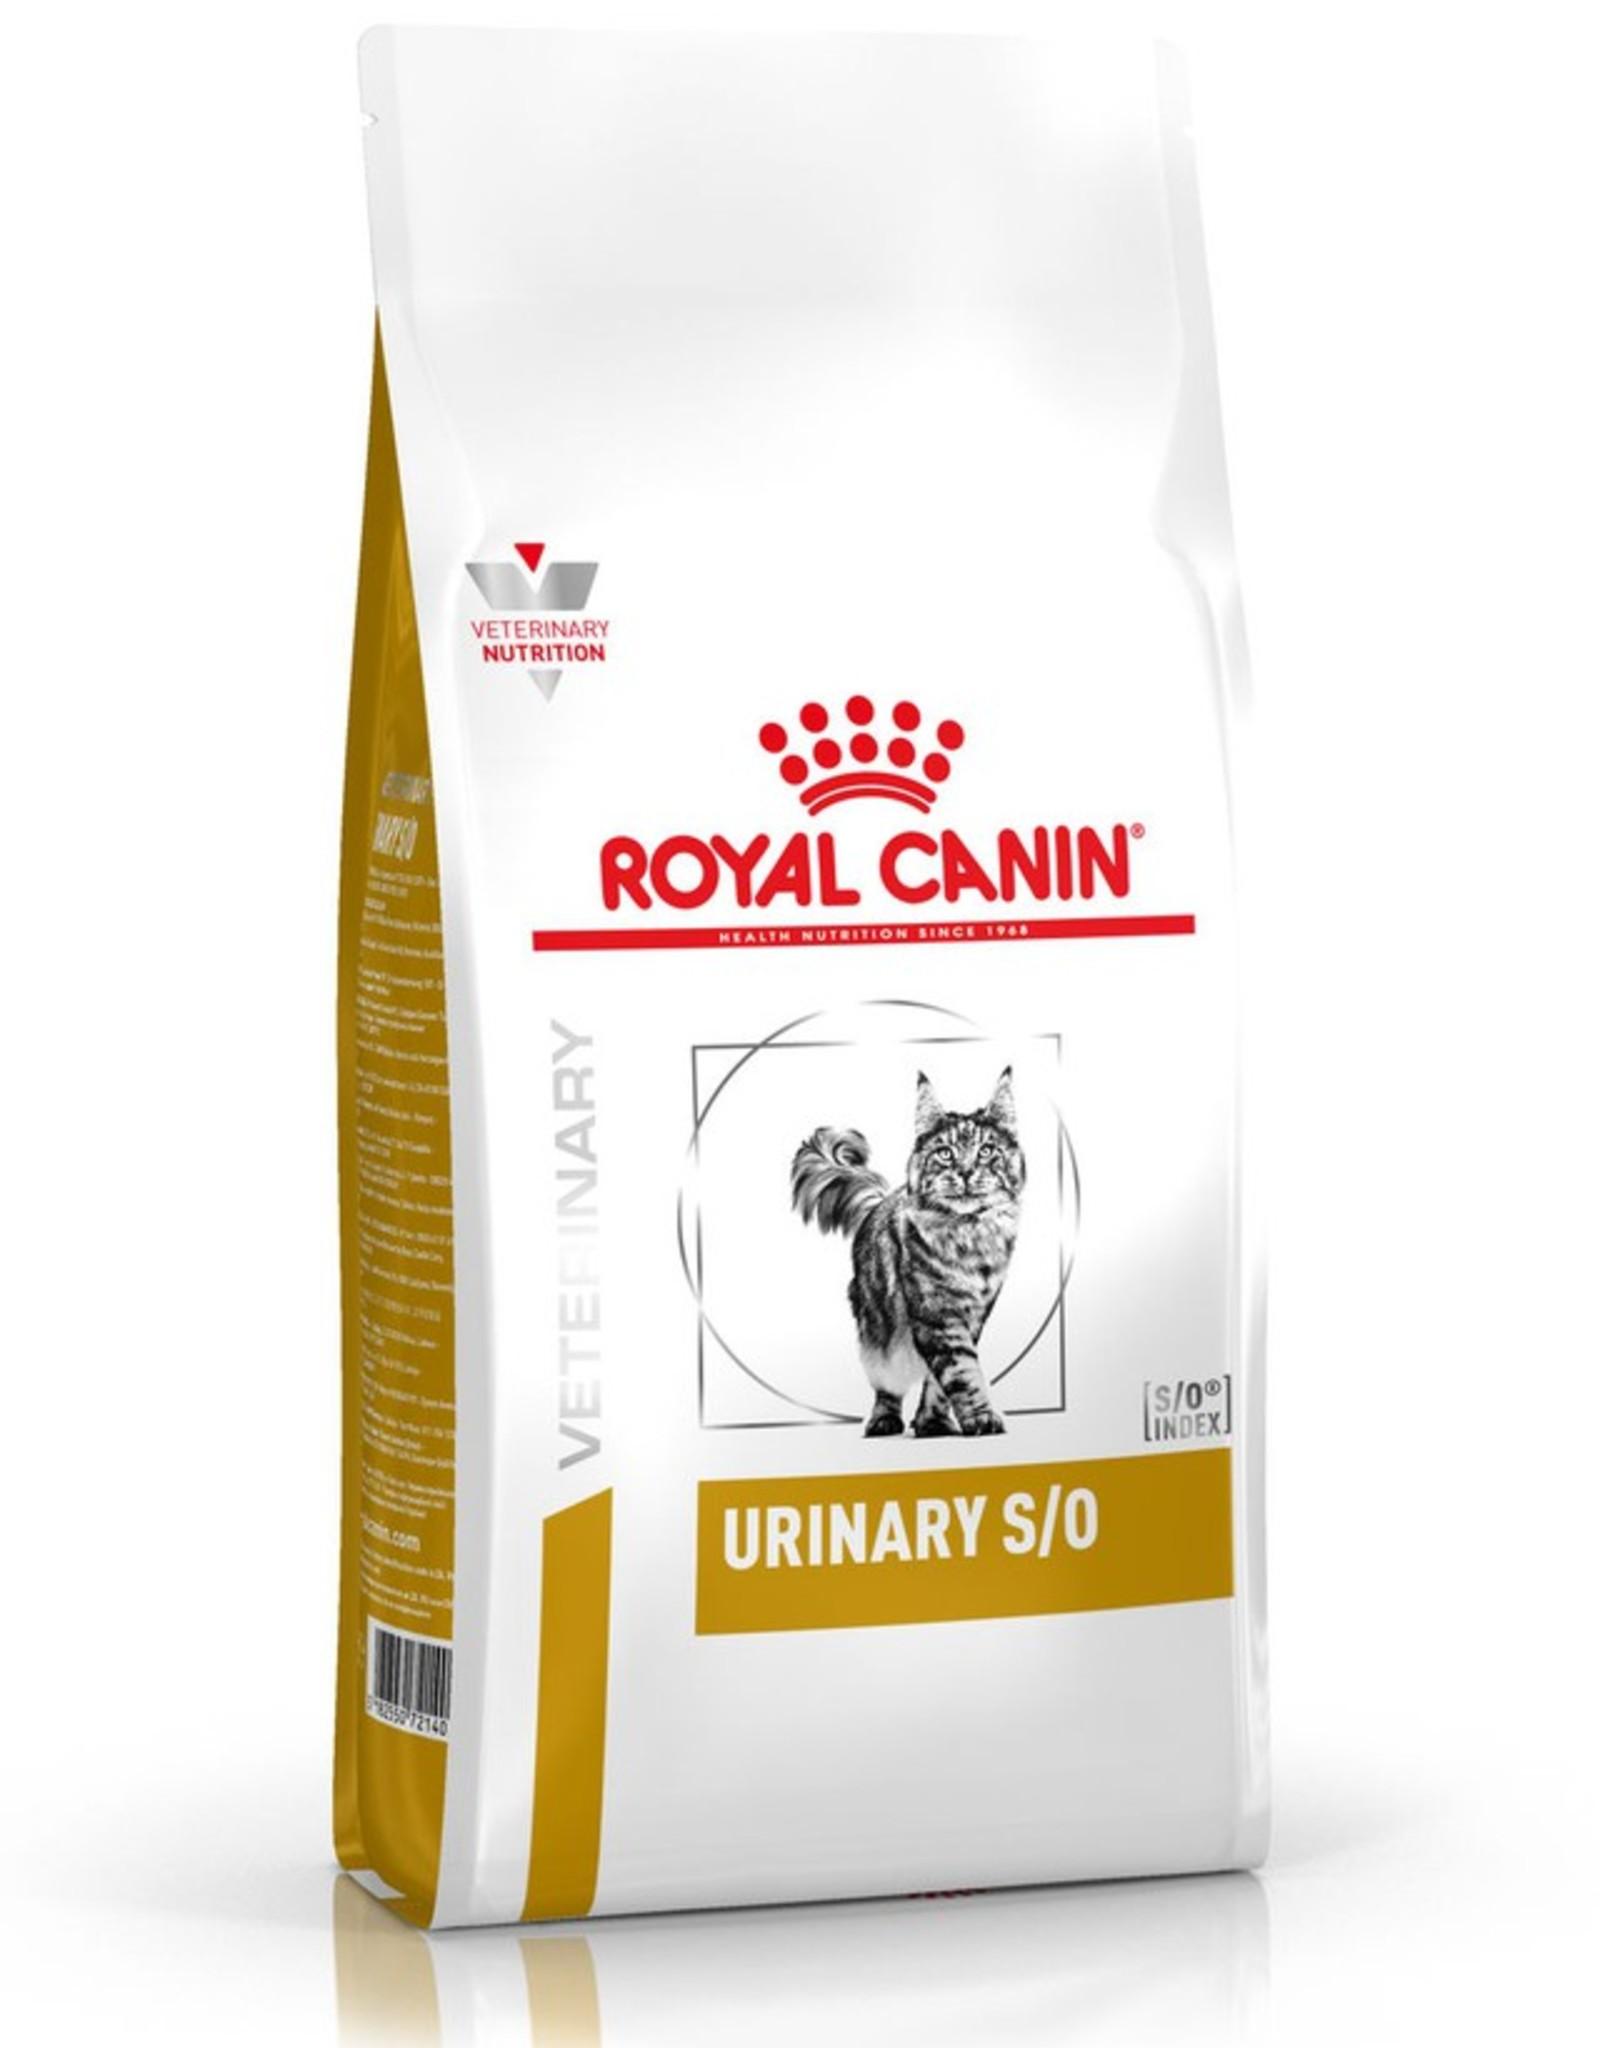 Royal Canin Royal Canin Urinary S/o Cat 1,5kg